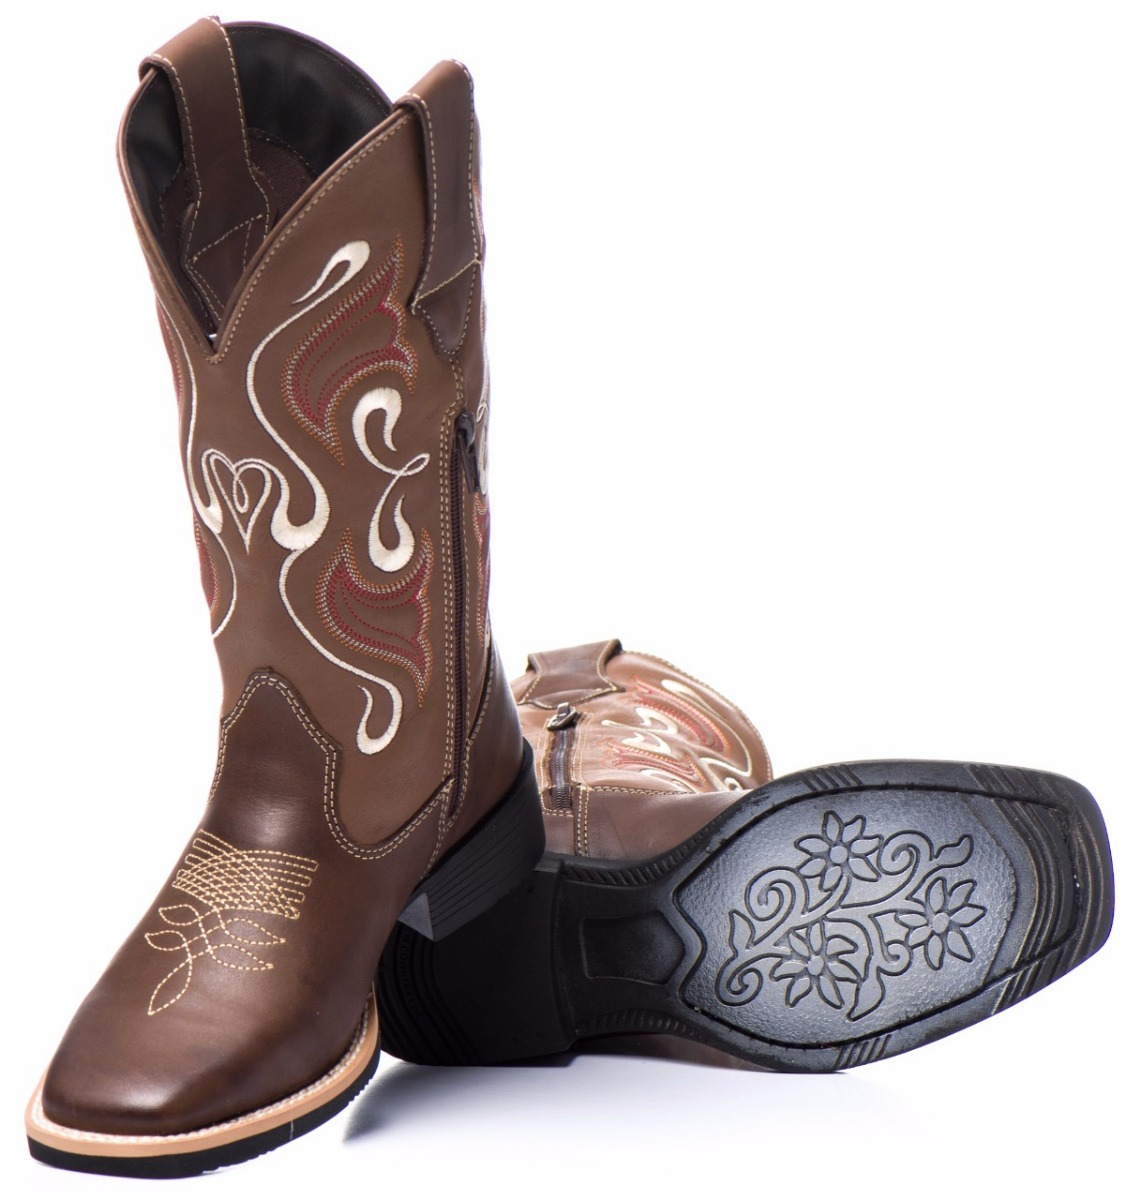 f6082dc3d Bota Country Texana Feminina Montaria Rainha Da Passarela - R$ 204 ...